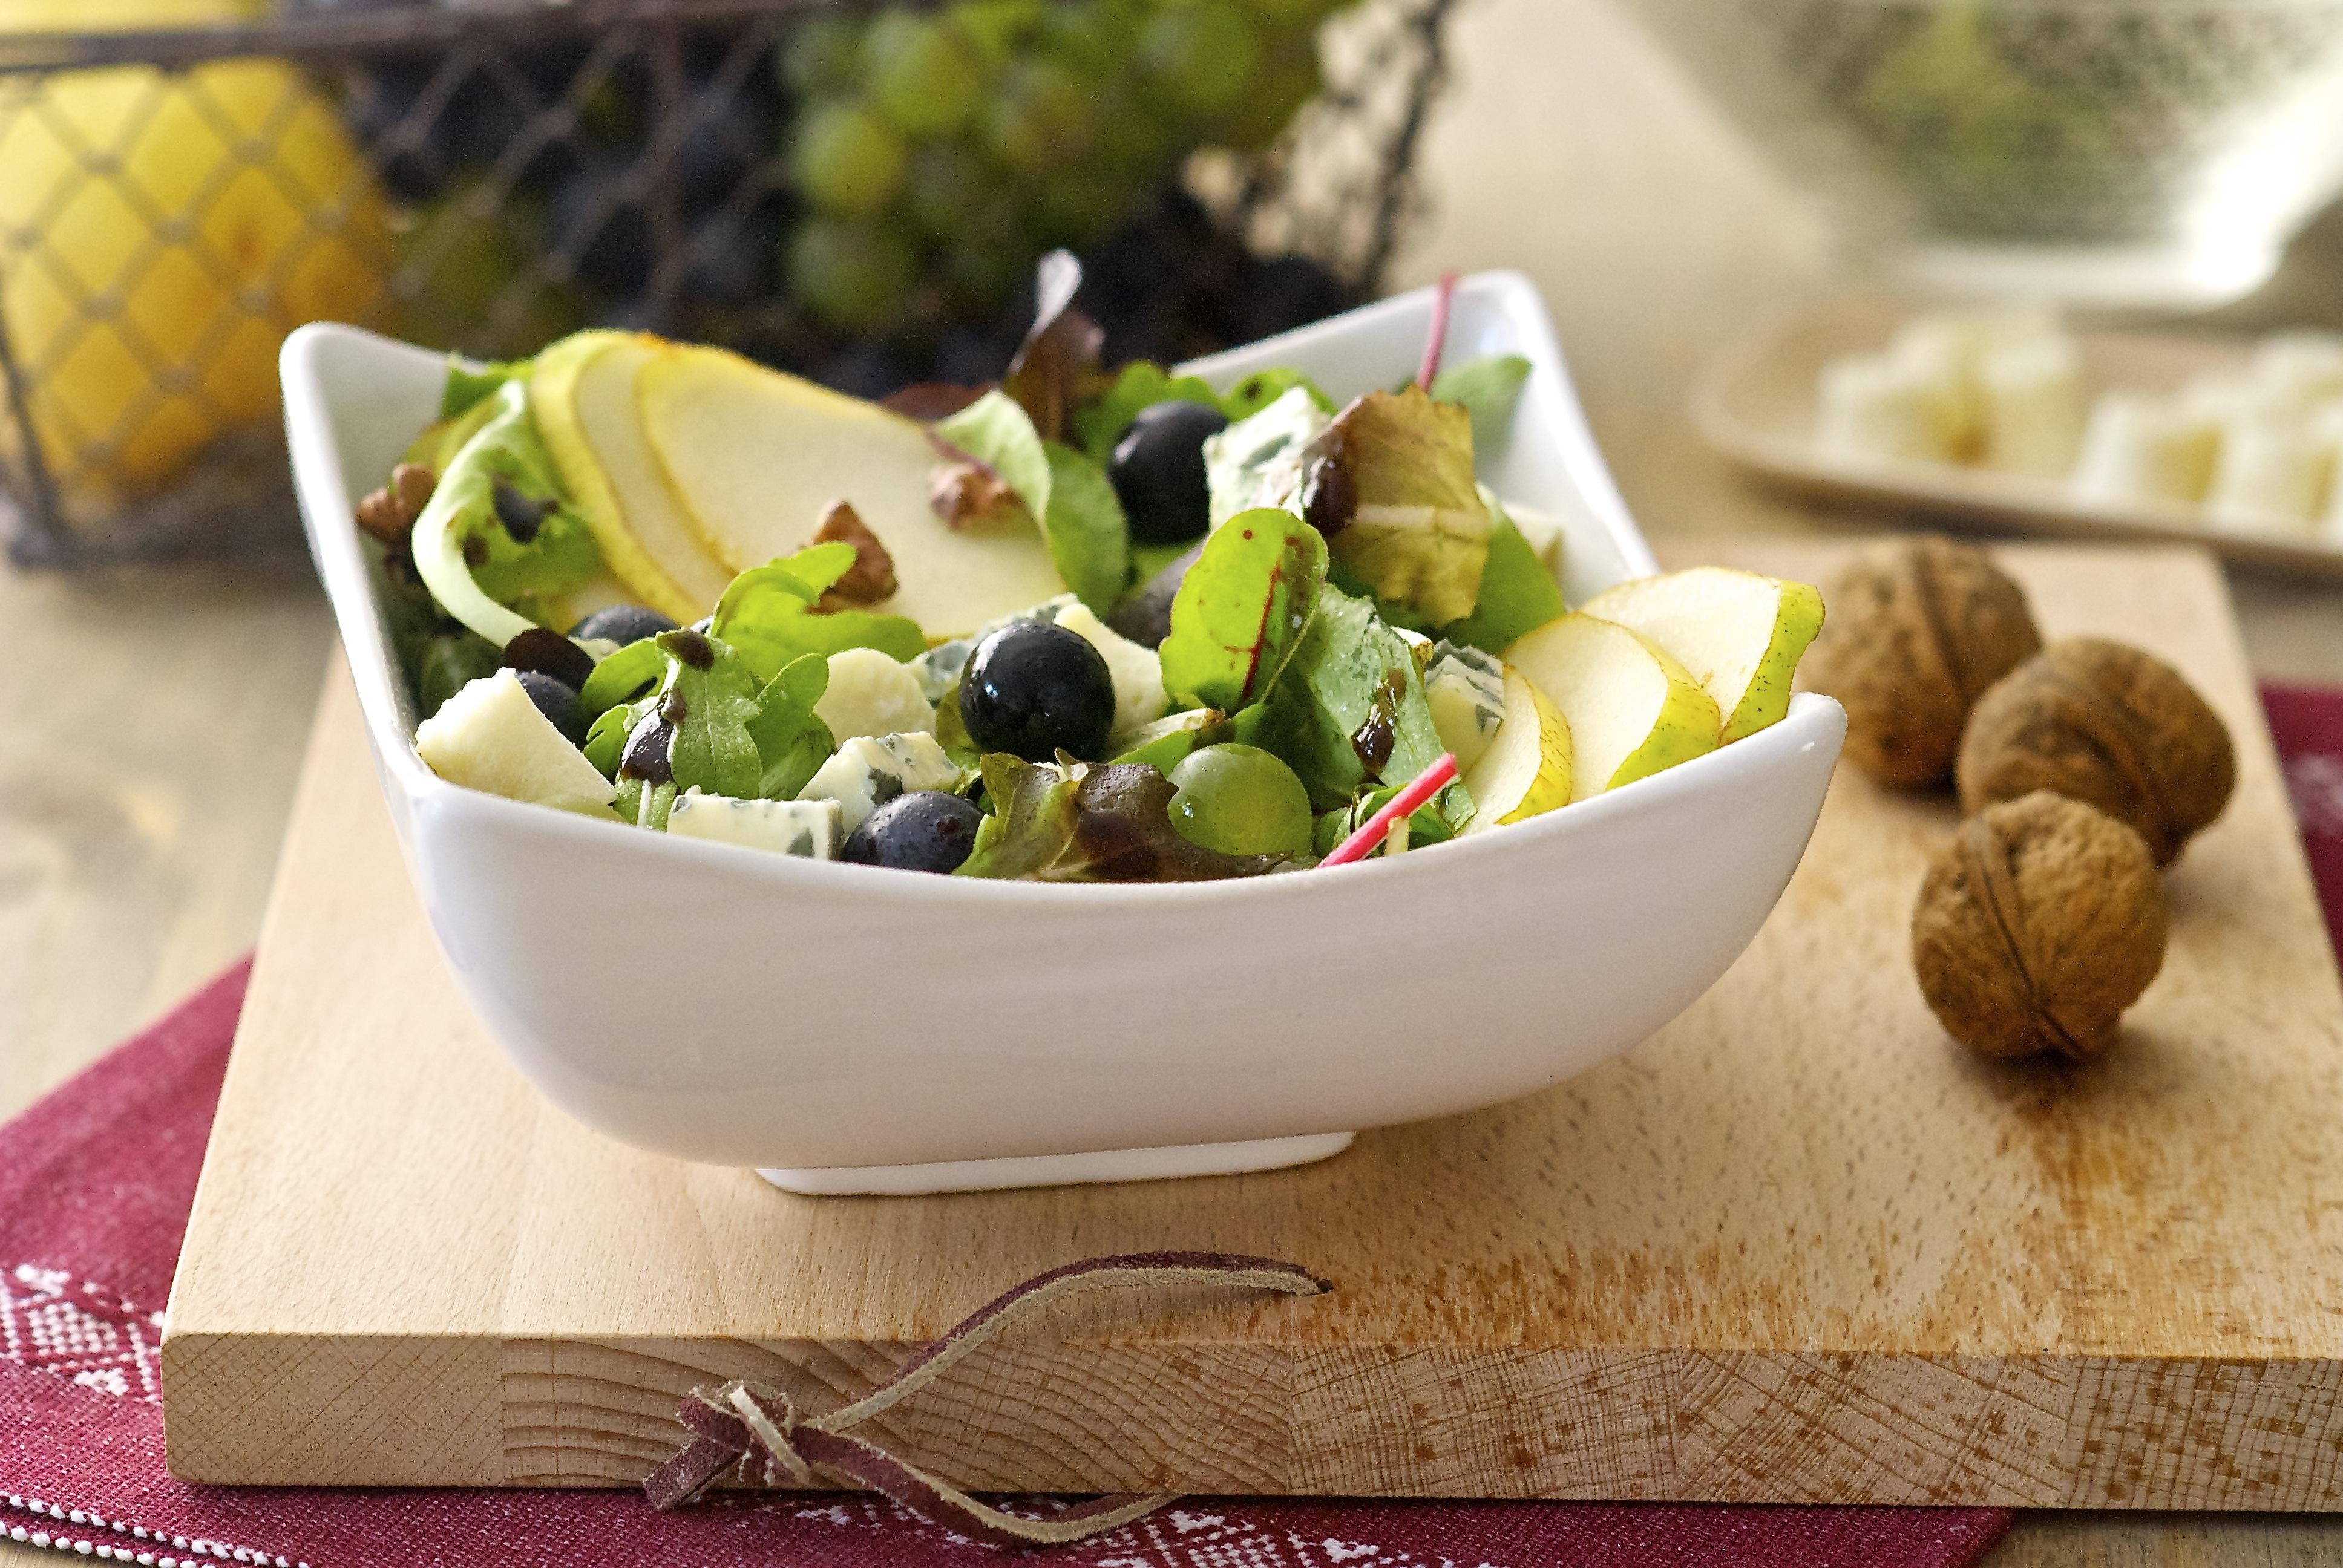 Salade d'automne sucrée-salée